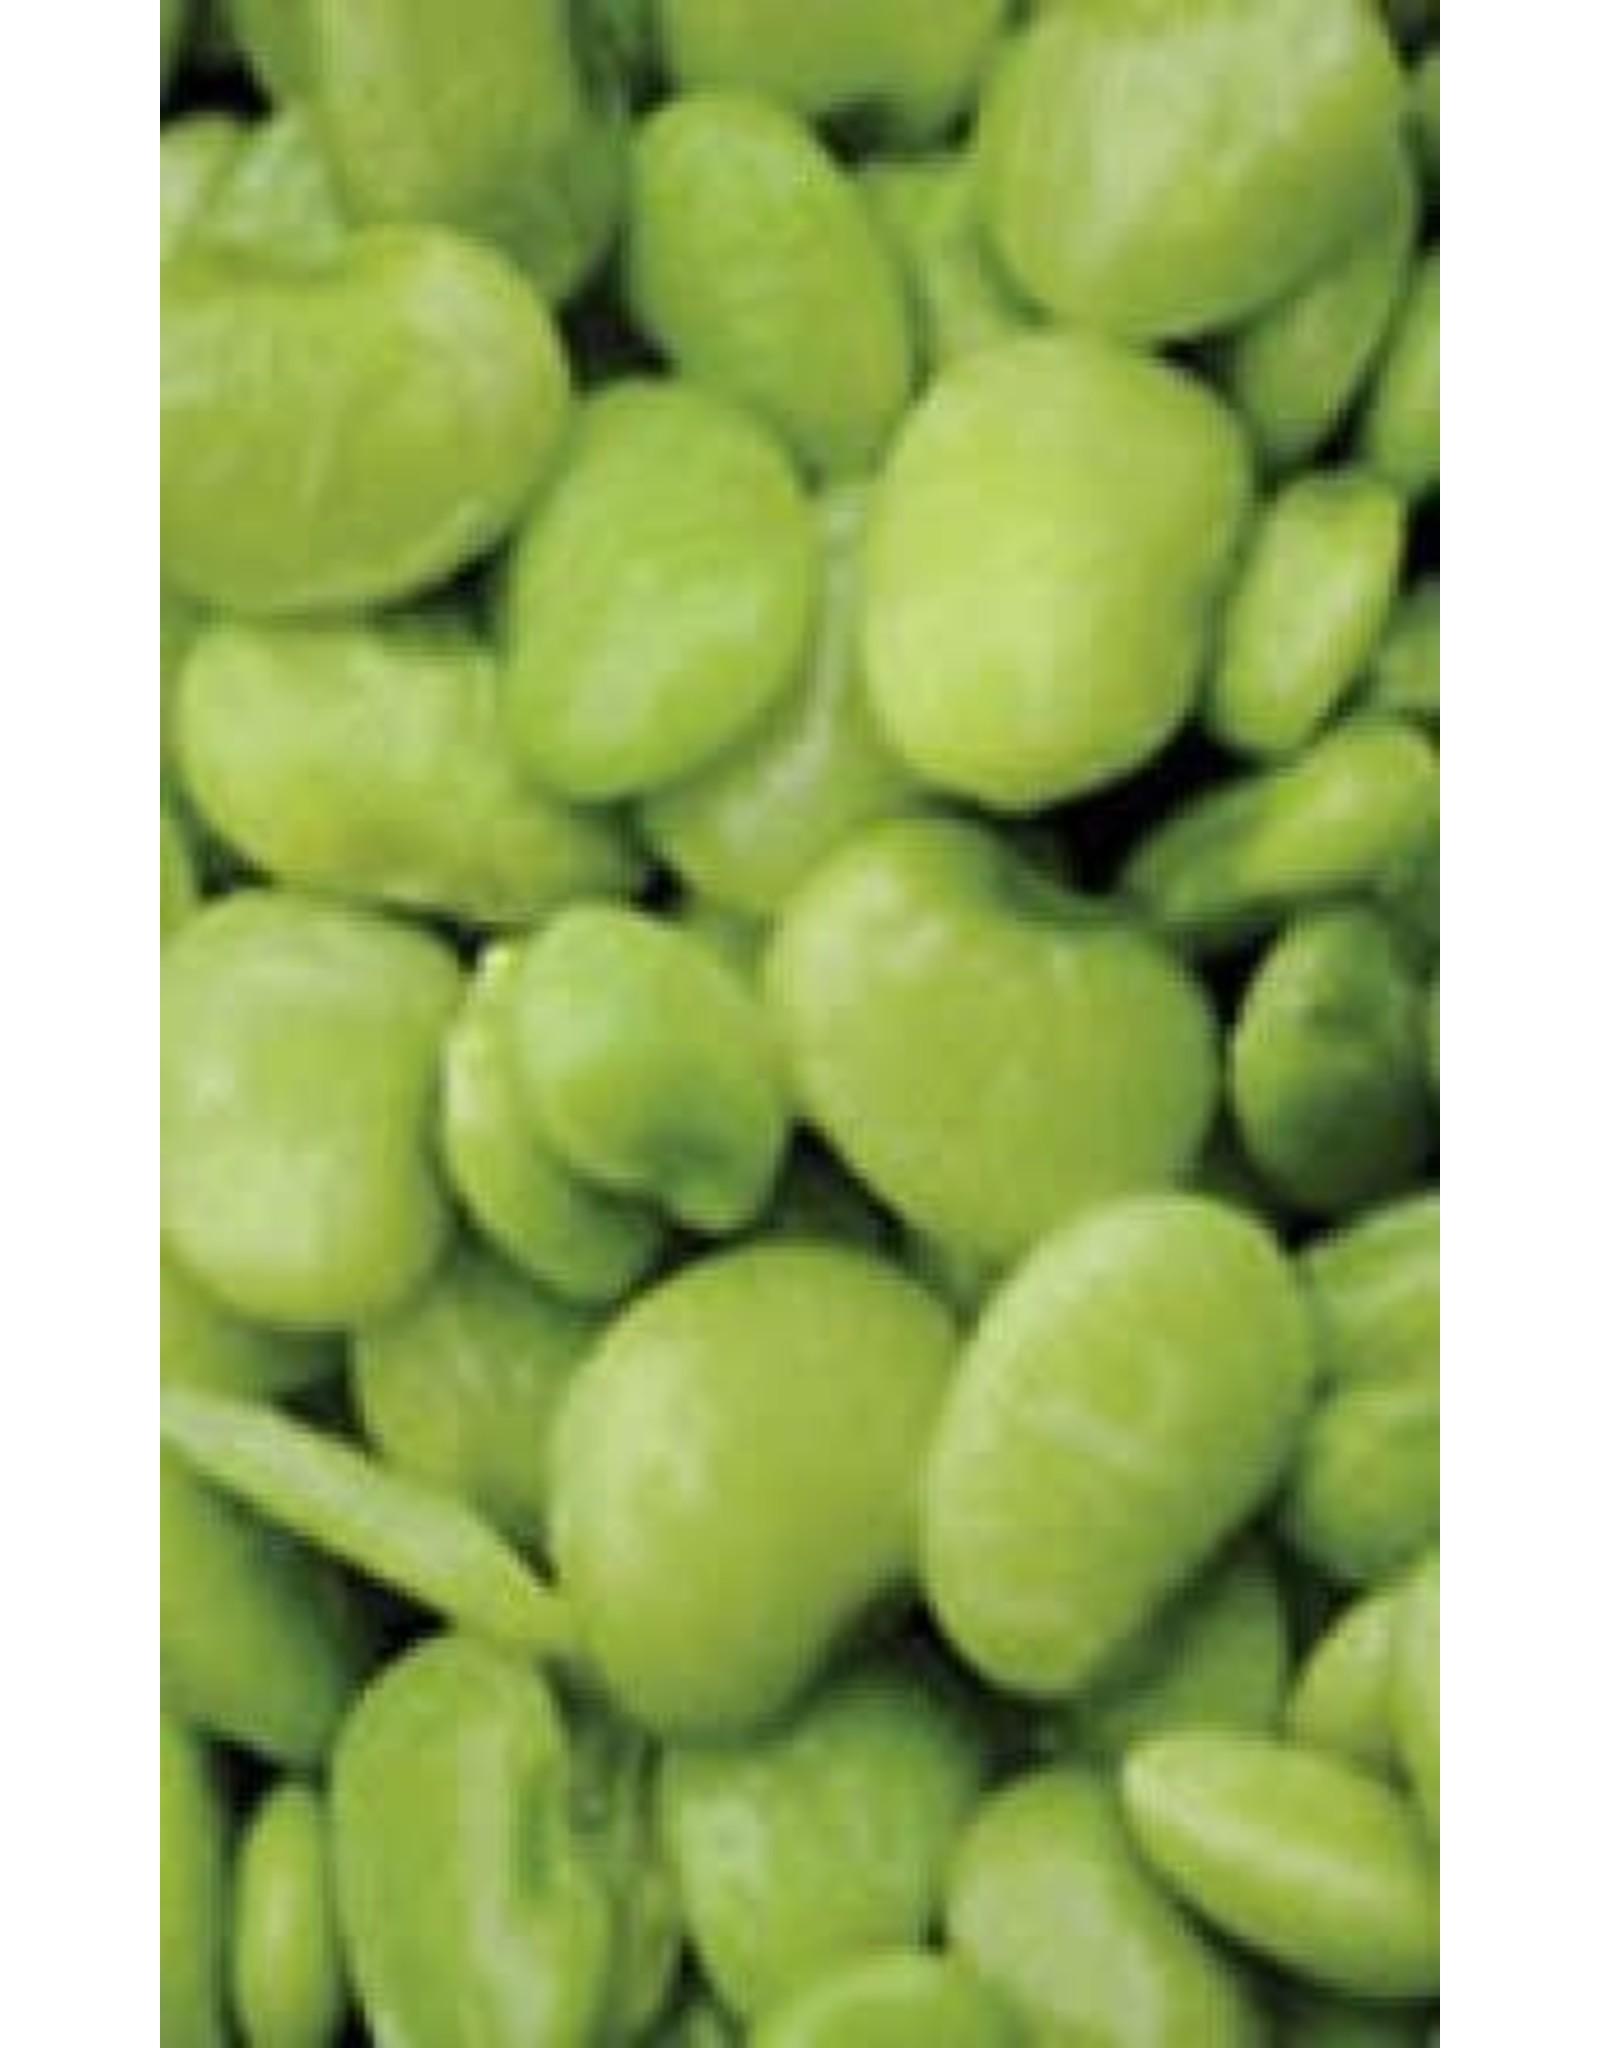 Fordhook Lima Bush Bean Seeds 1200